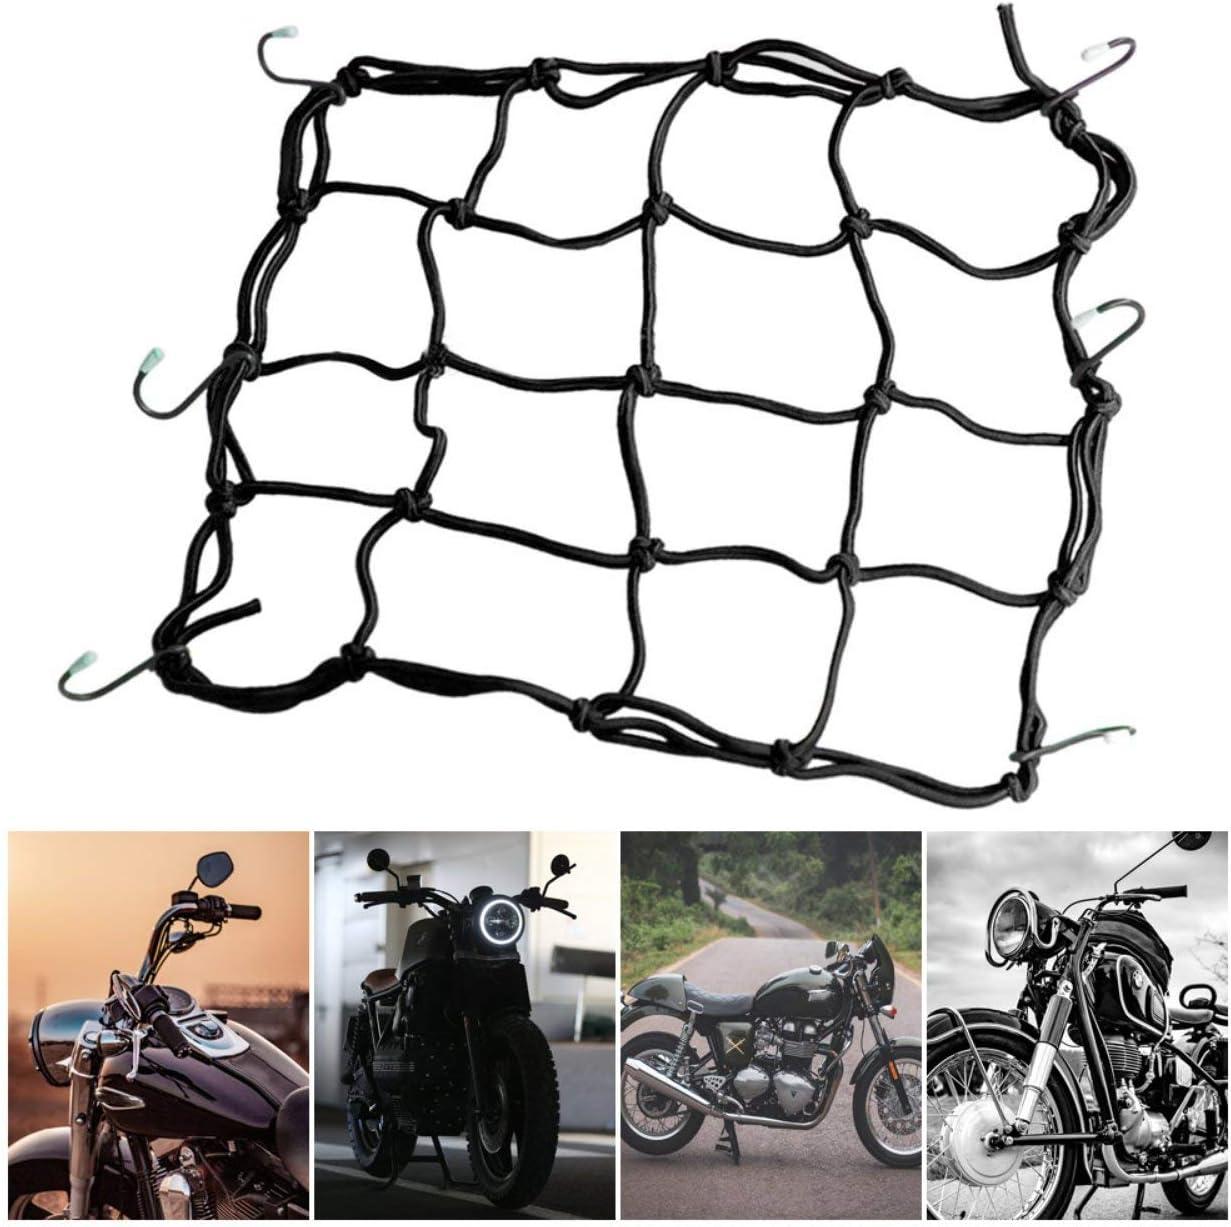 30x30cm Luggage Cargo Mesh Net Car Accessories Motorcycle Bike Helmet Holder